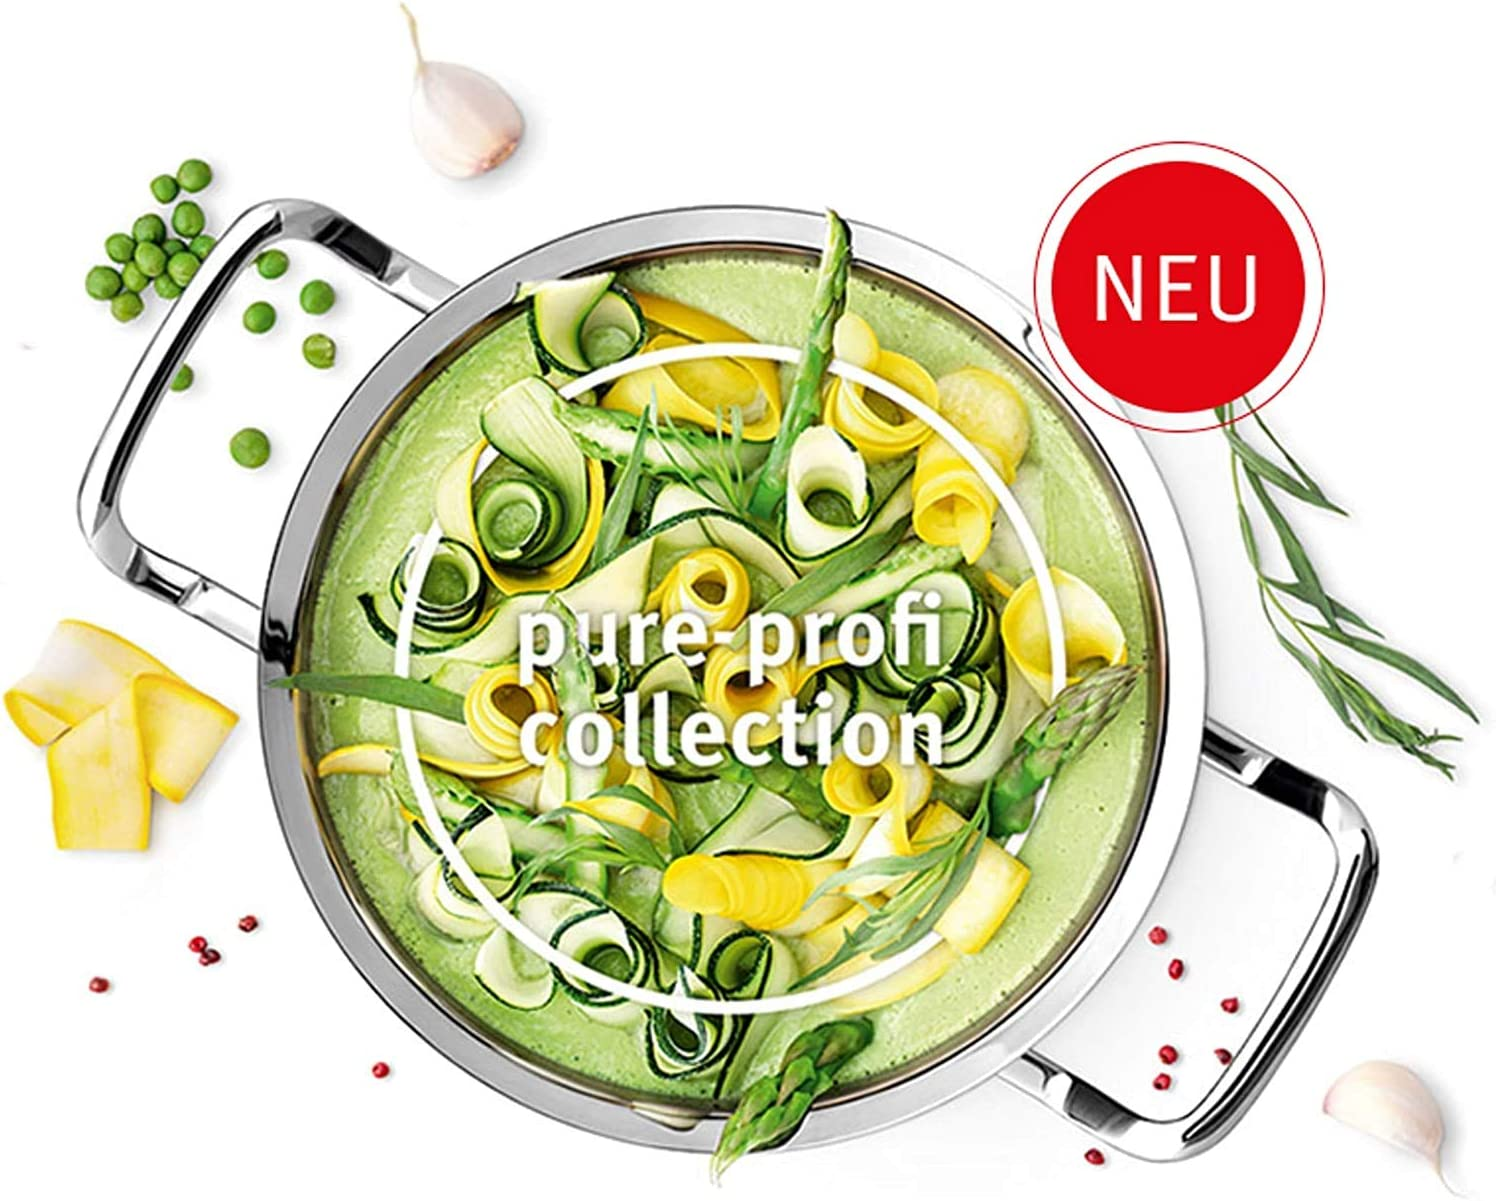 /Ø 20 cm, 2,6 Liter Br/äter mit Metall-Deckel Fissler pure-profi collection // Braten-Topf Edelstahl-Kochtopf Induktion